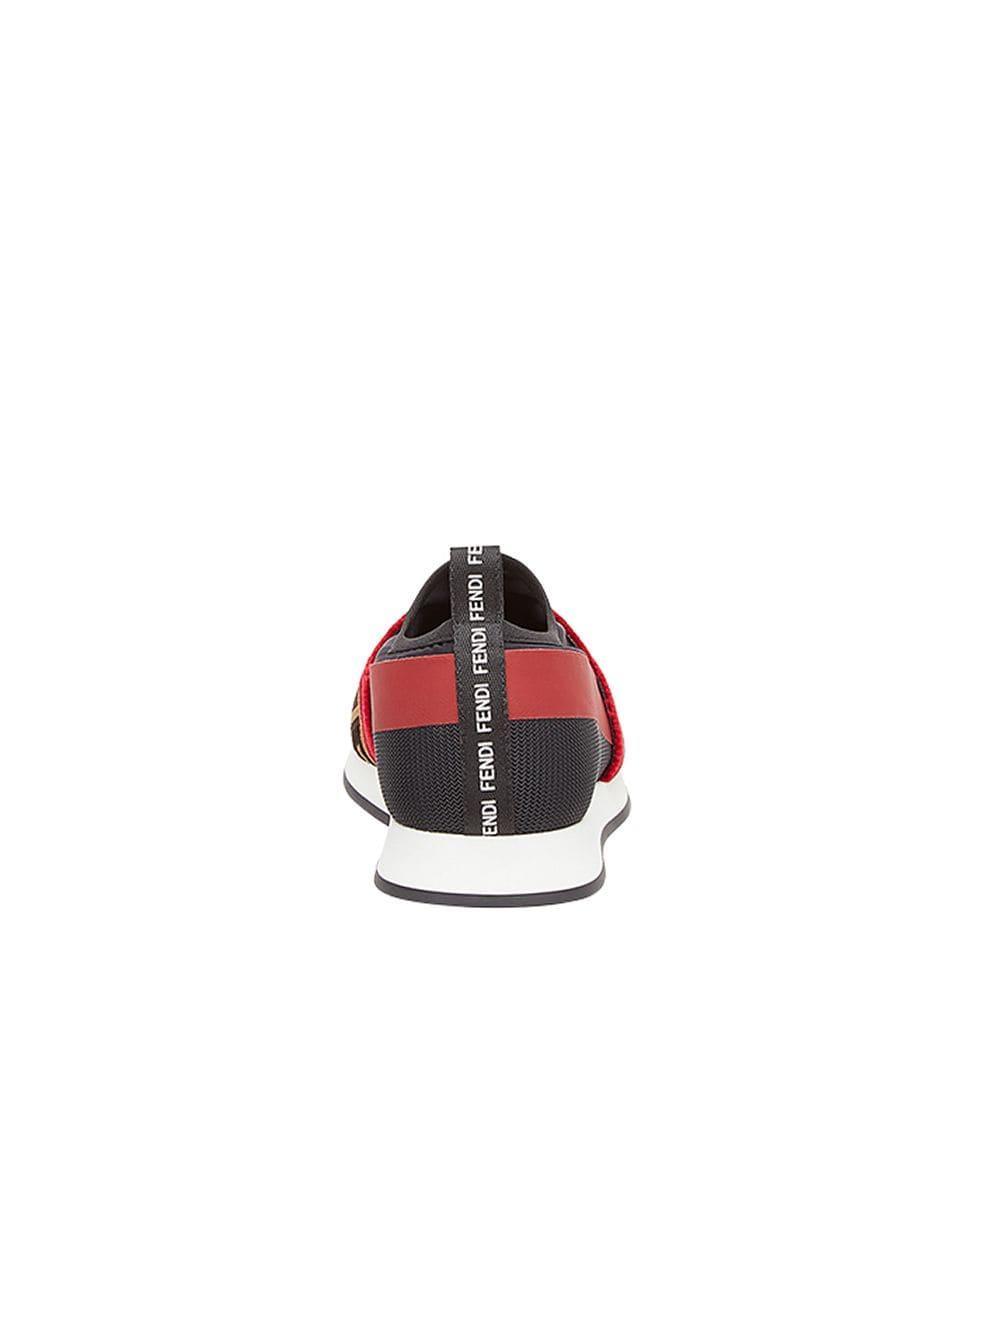 Fendi Rubber Brown Colibri Leather And Mesh Sneakers in Black